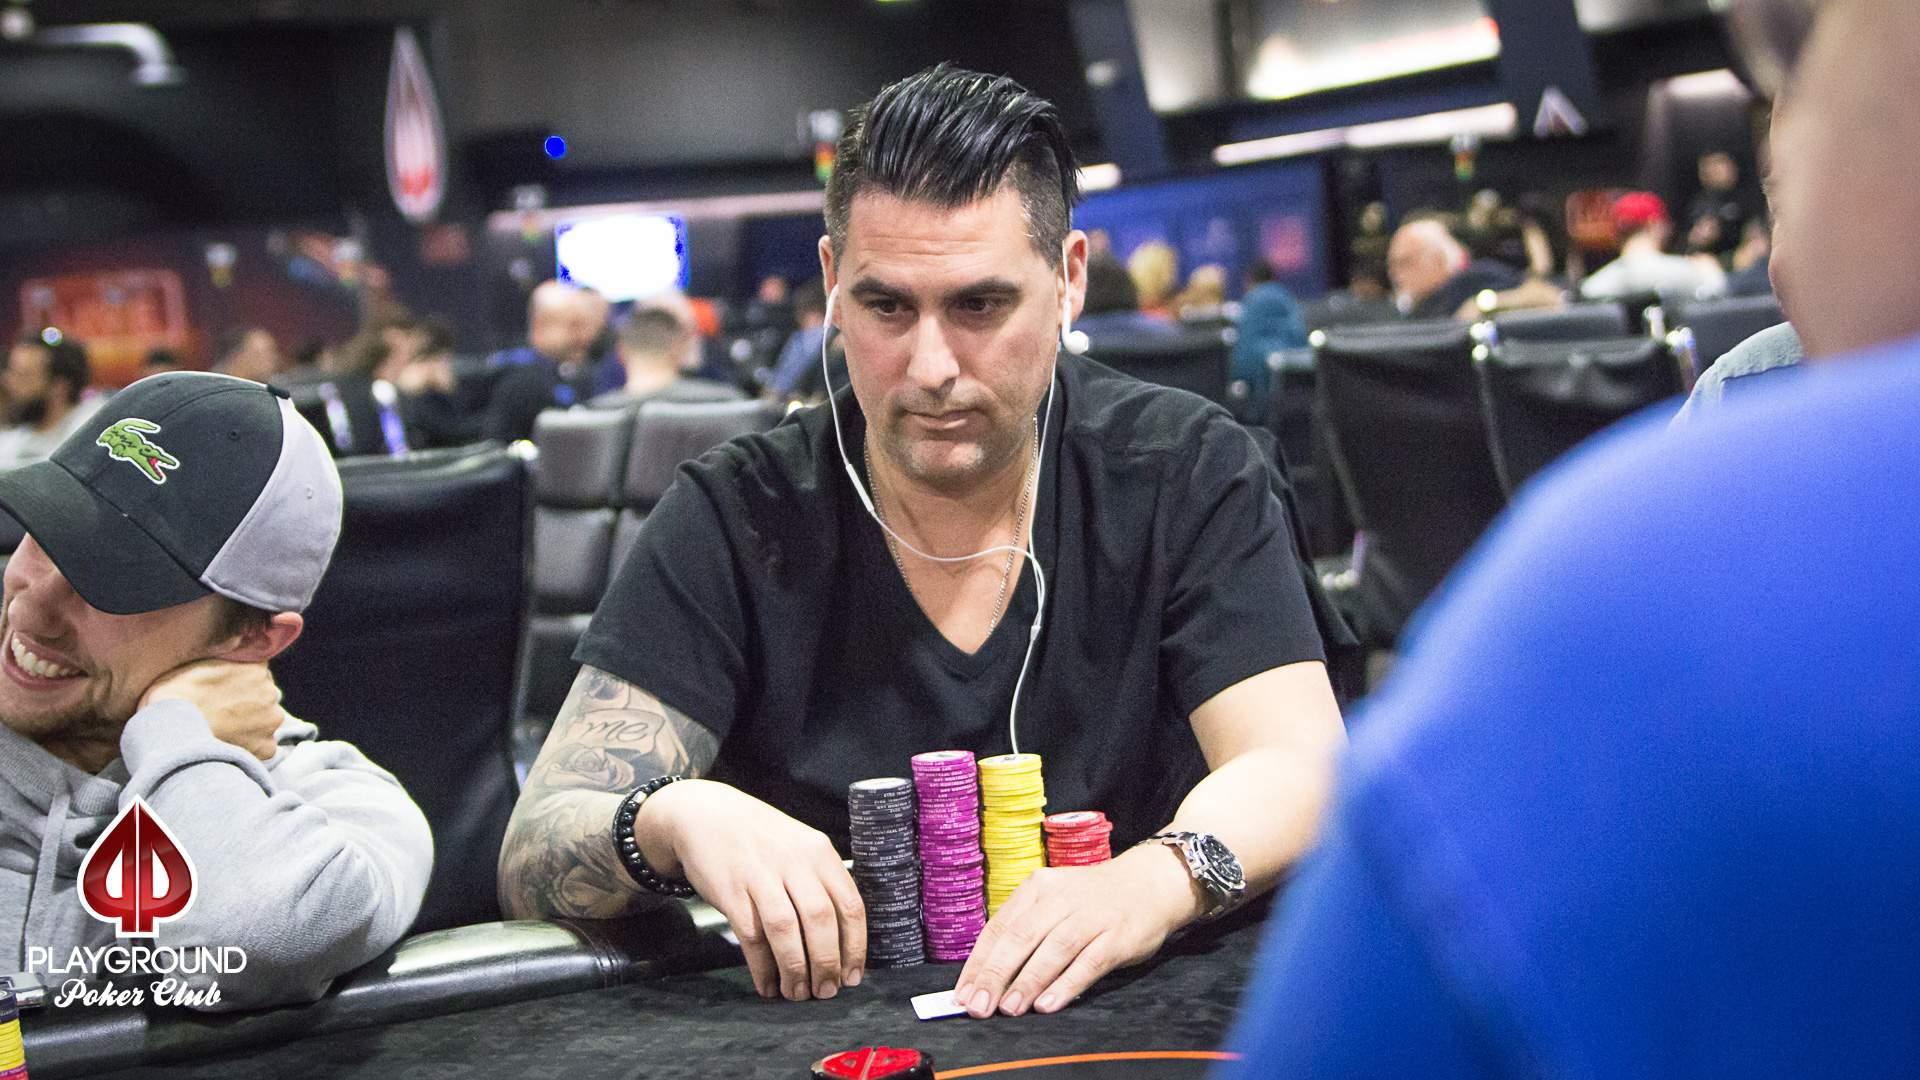 Free poker mackay game casino slots